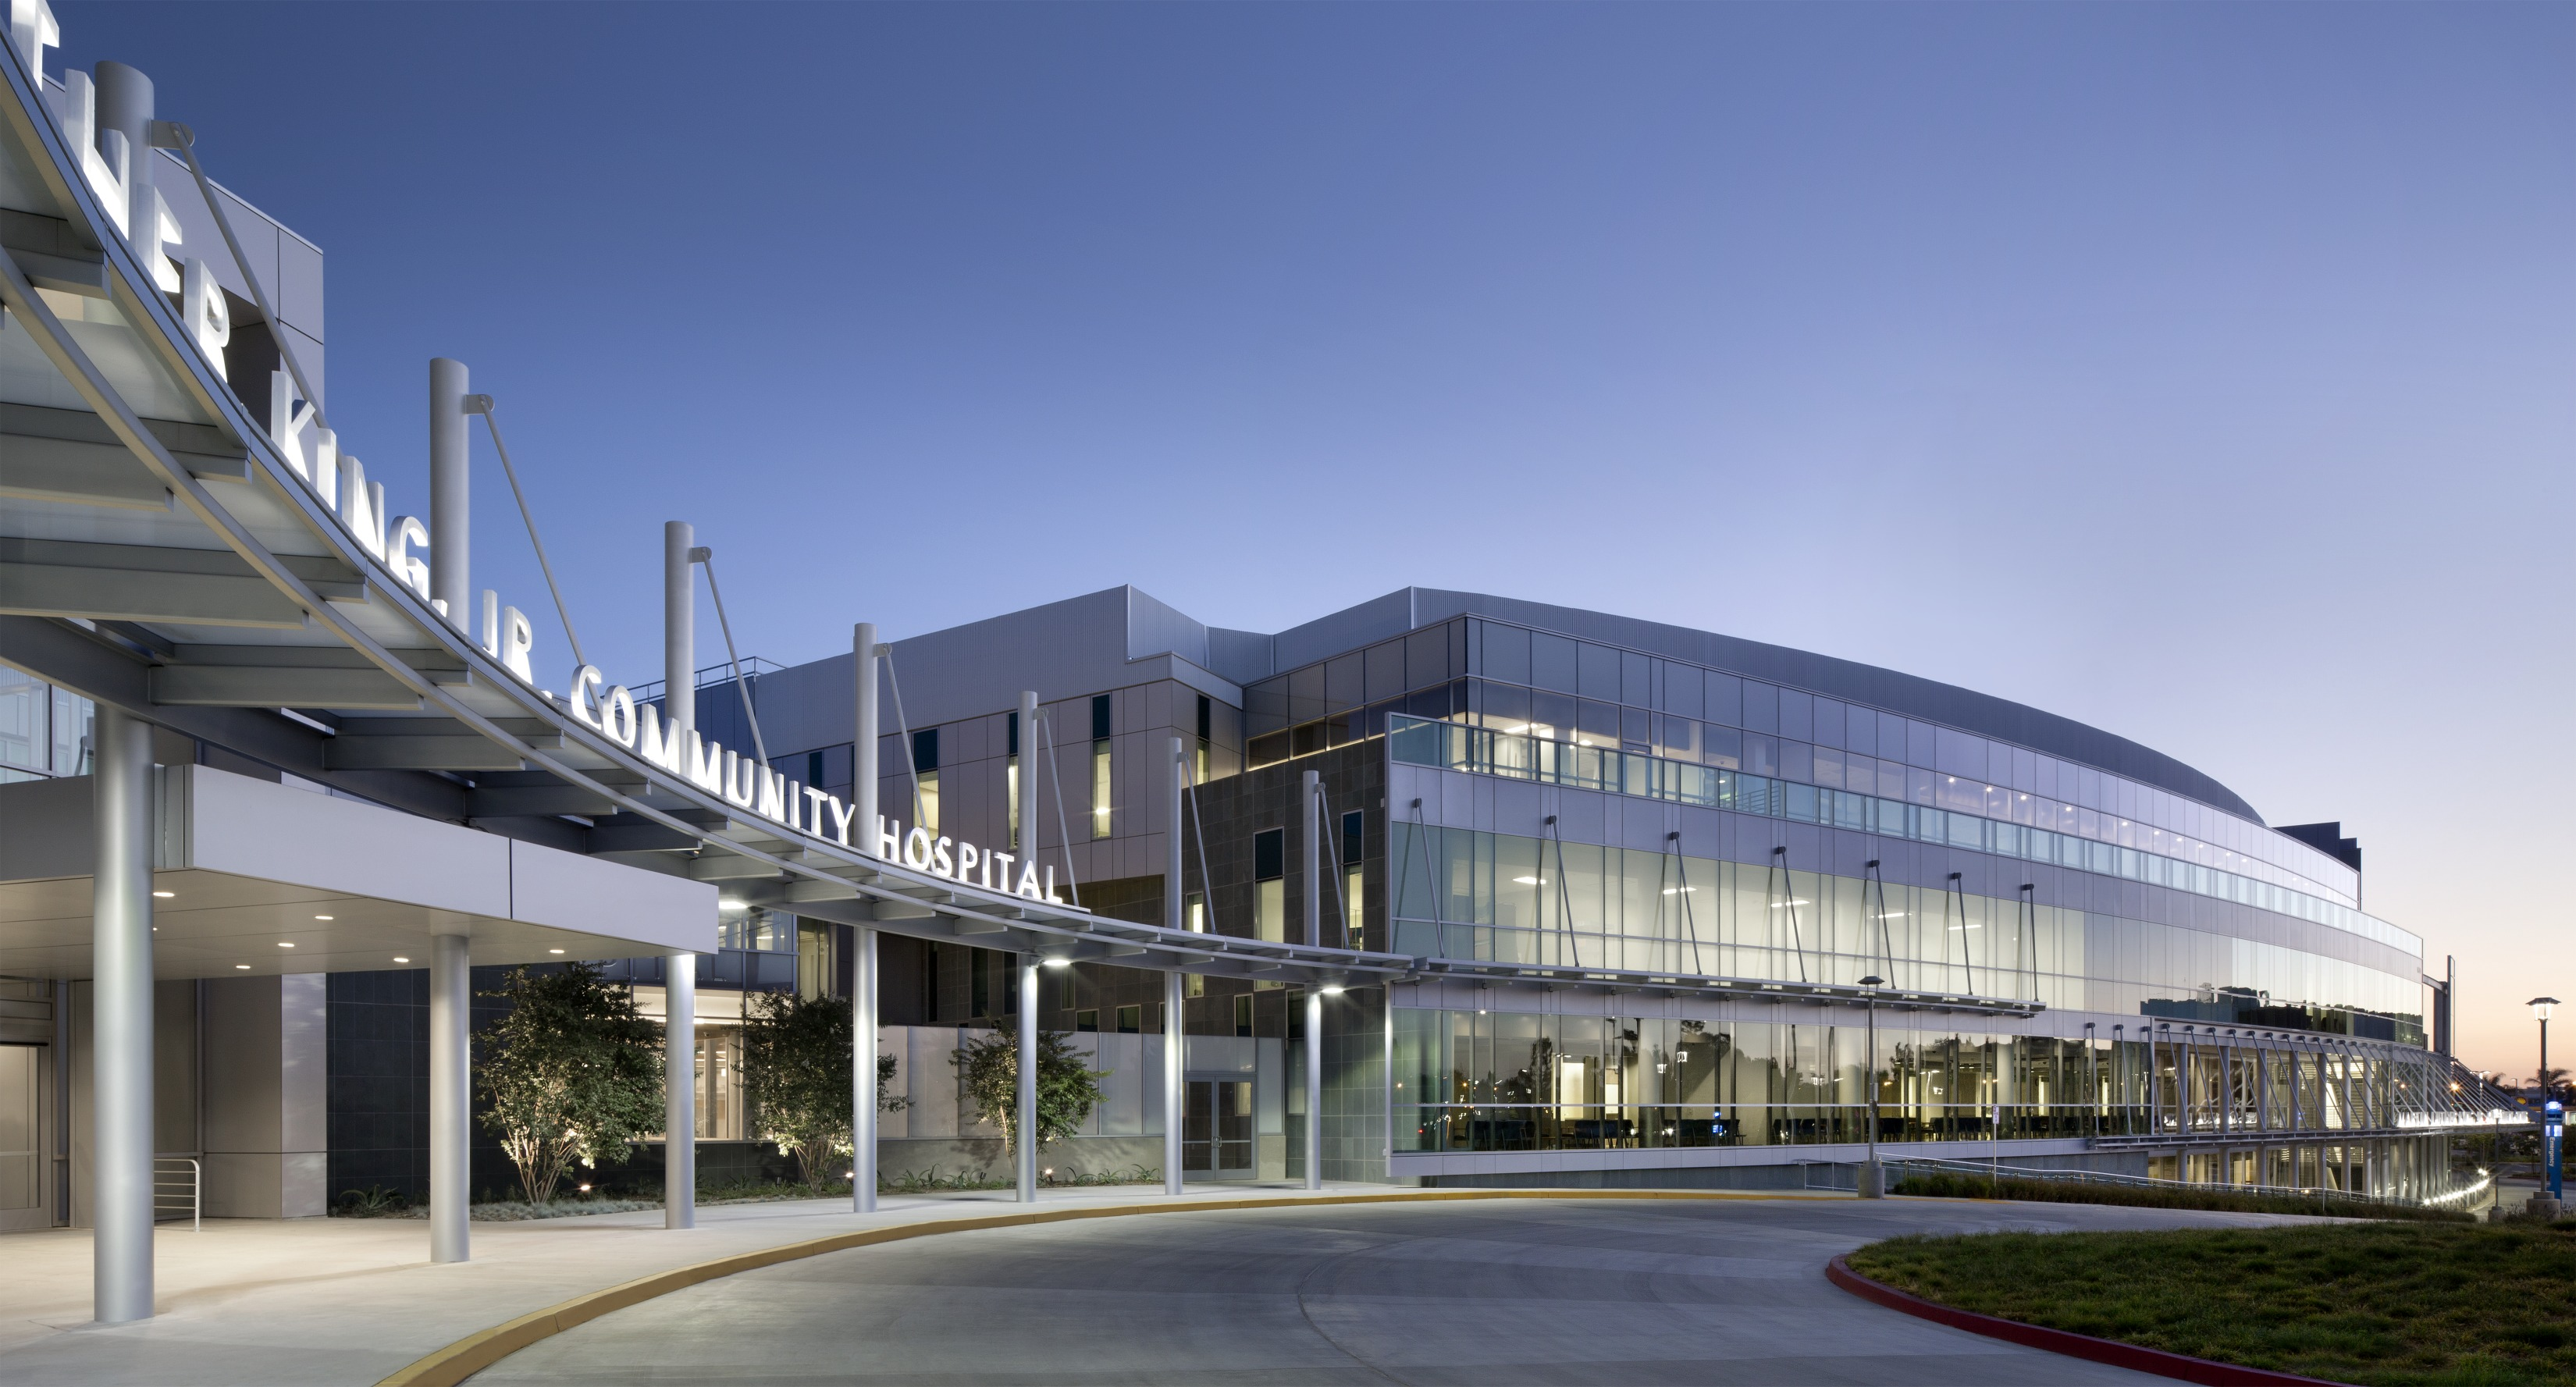 MLK, Jr. Outpatient Care Center